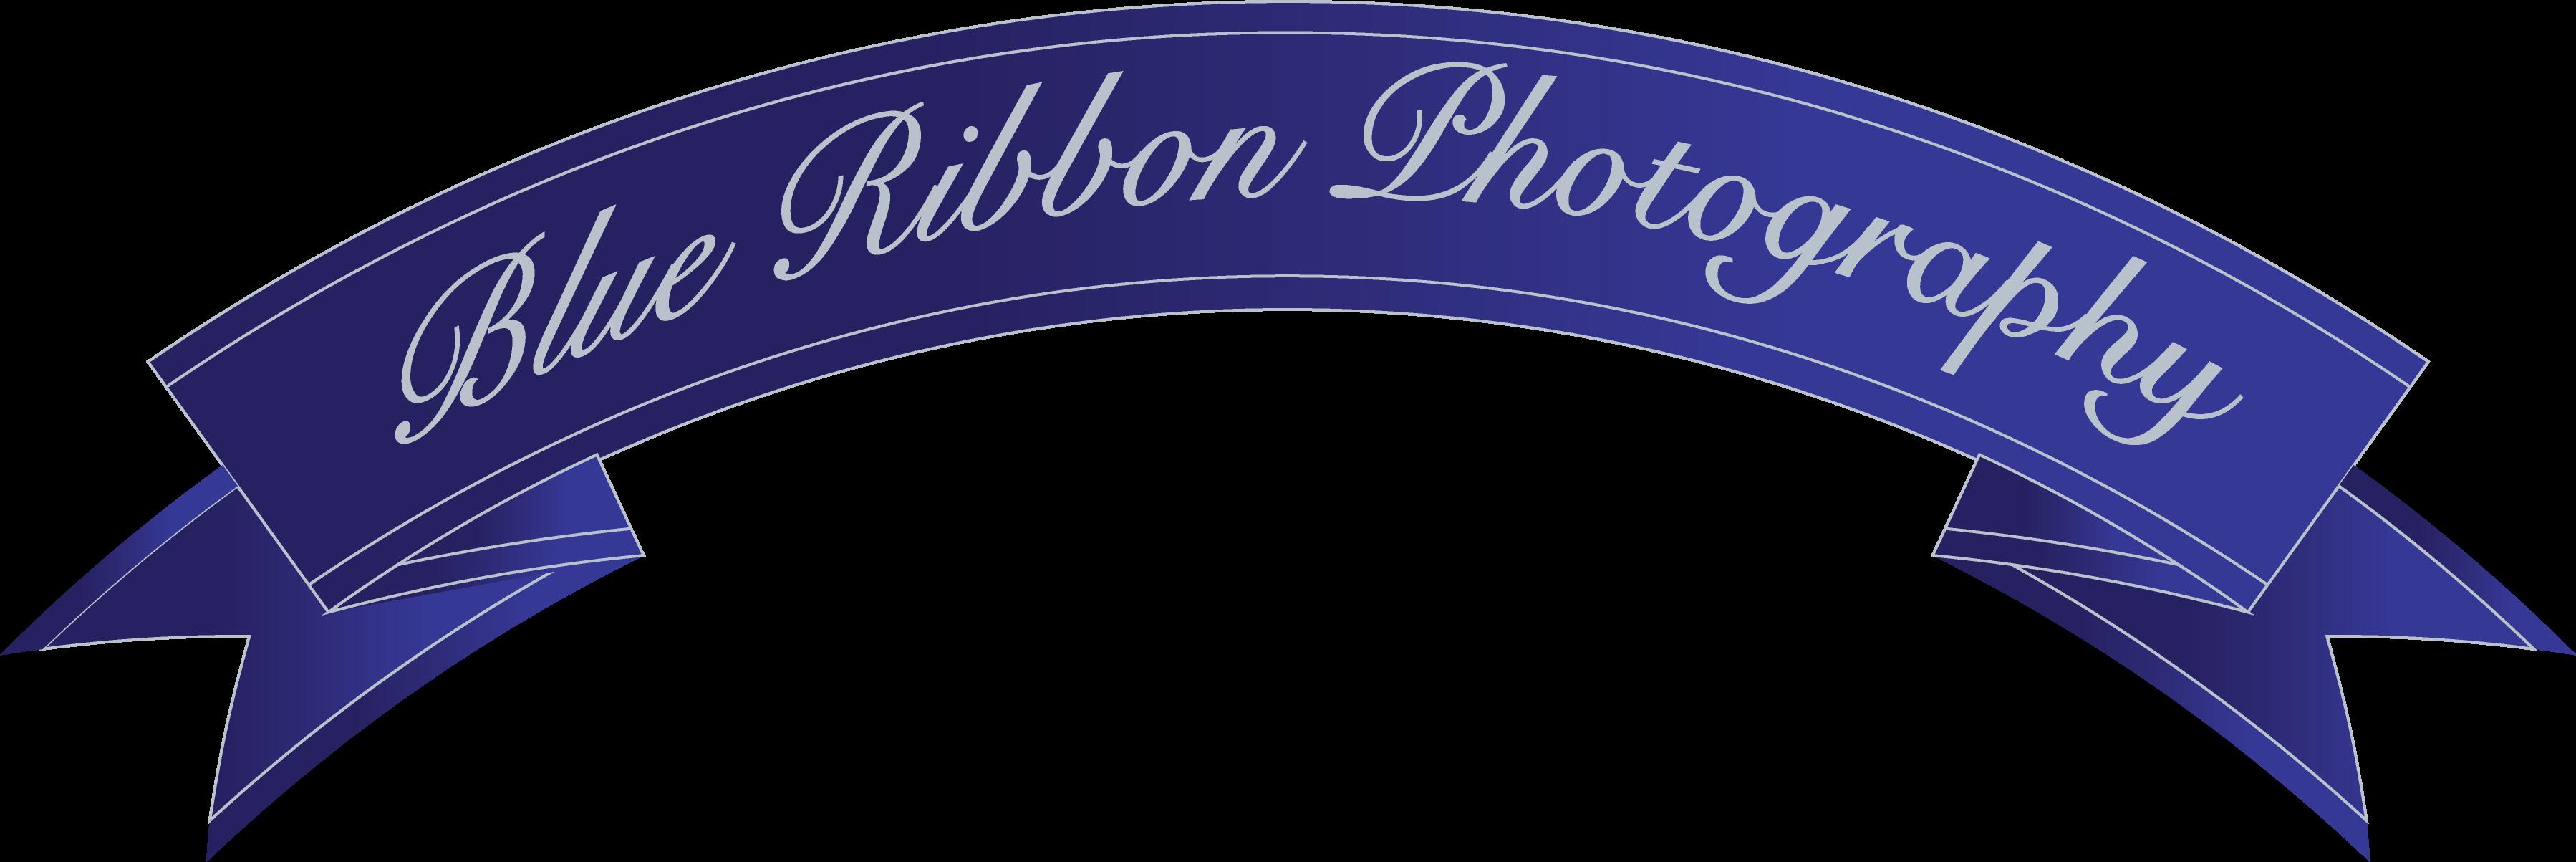 Blue Ribbon Photography